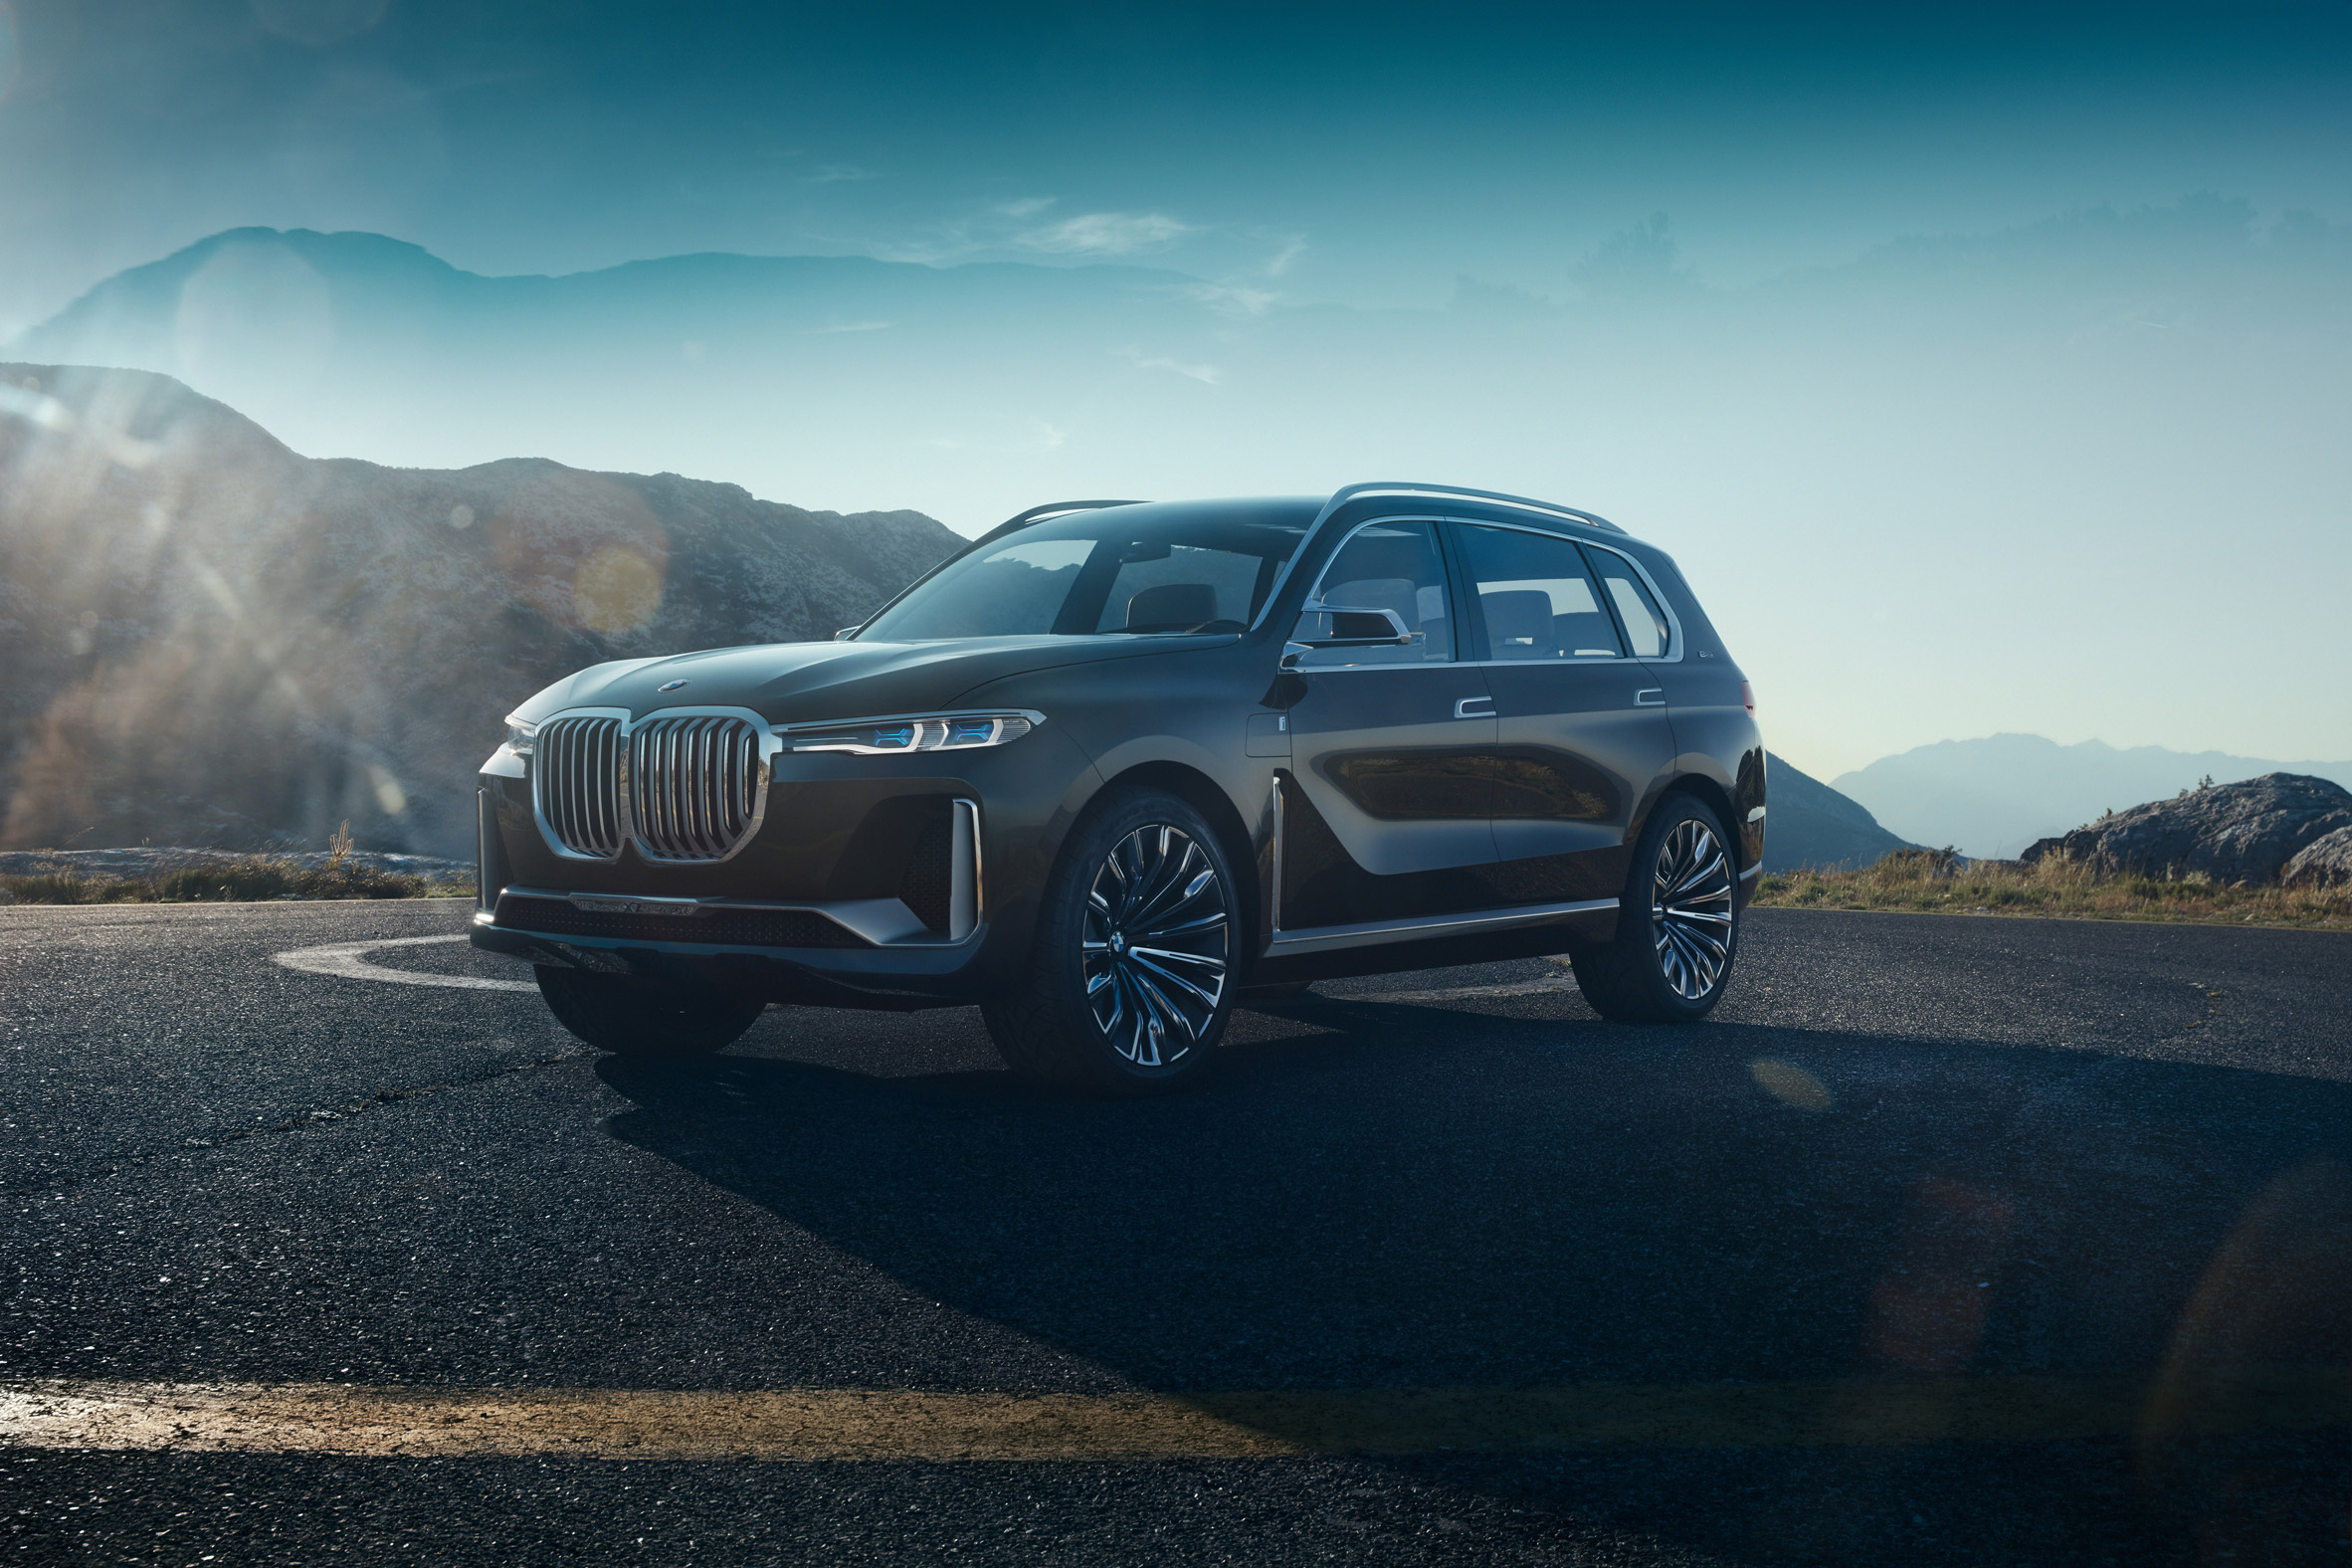 BMW unveils spacious X7 concept car as part of expanded luxury vehicle range